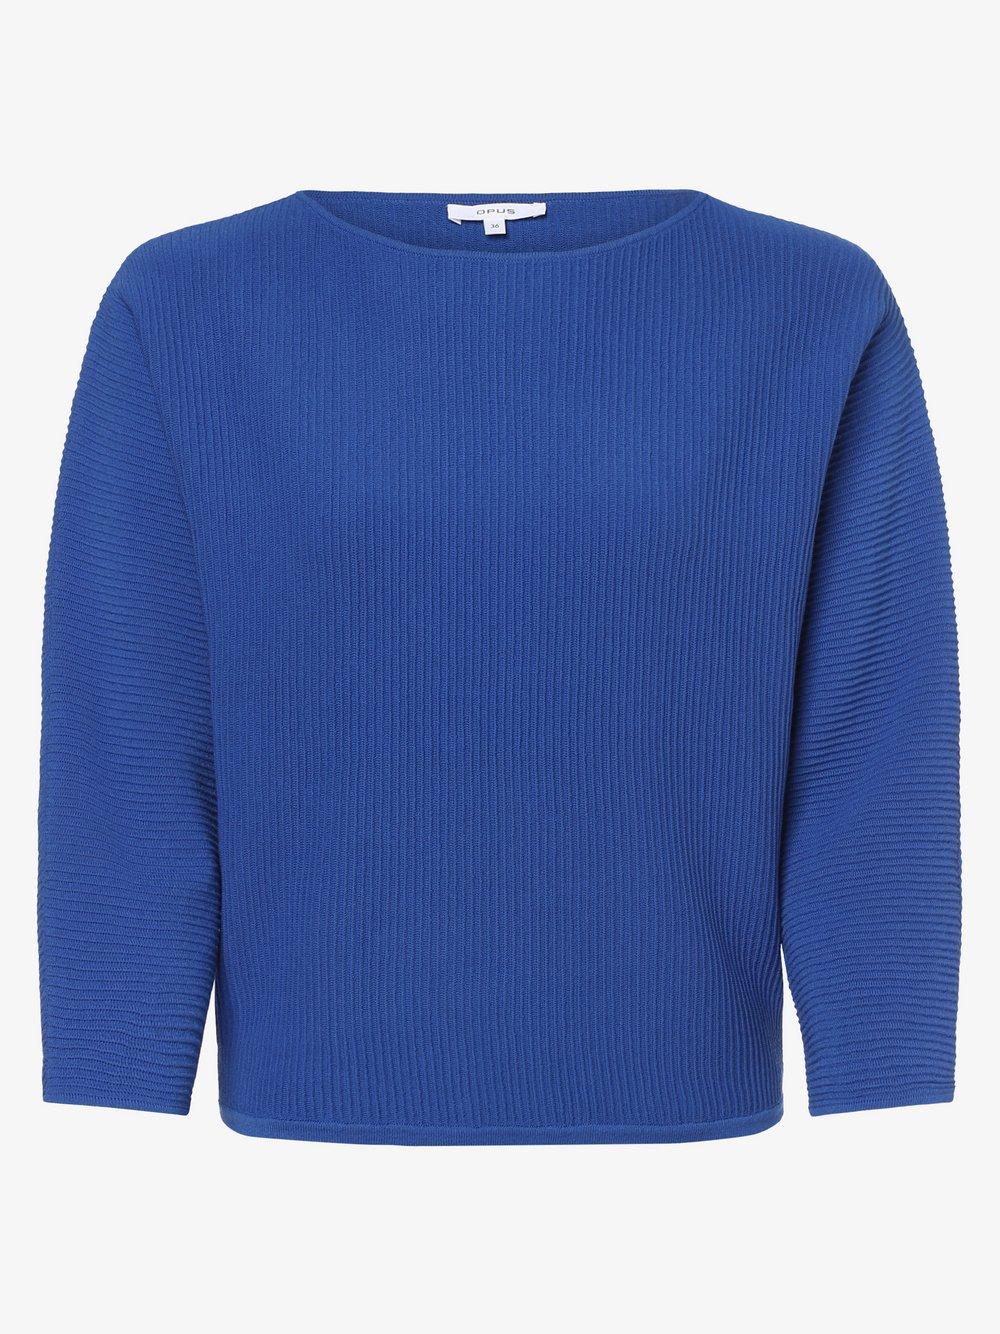 Opus - Sweter damski – Piika, niebieski